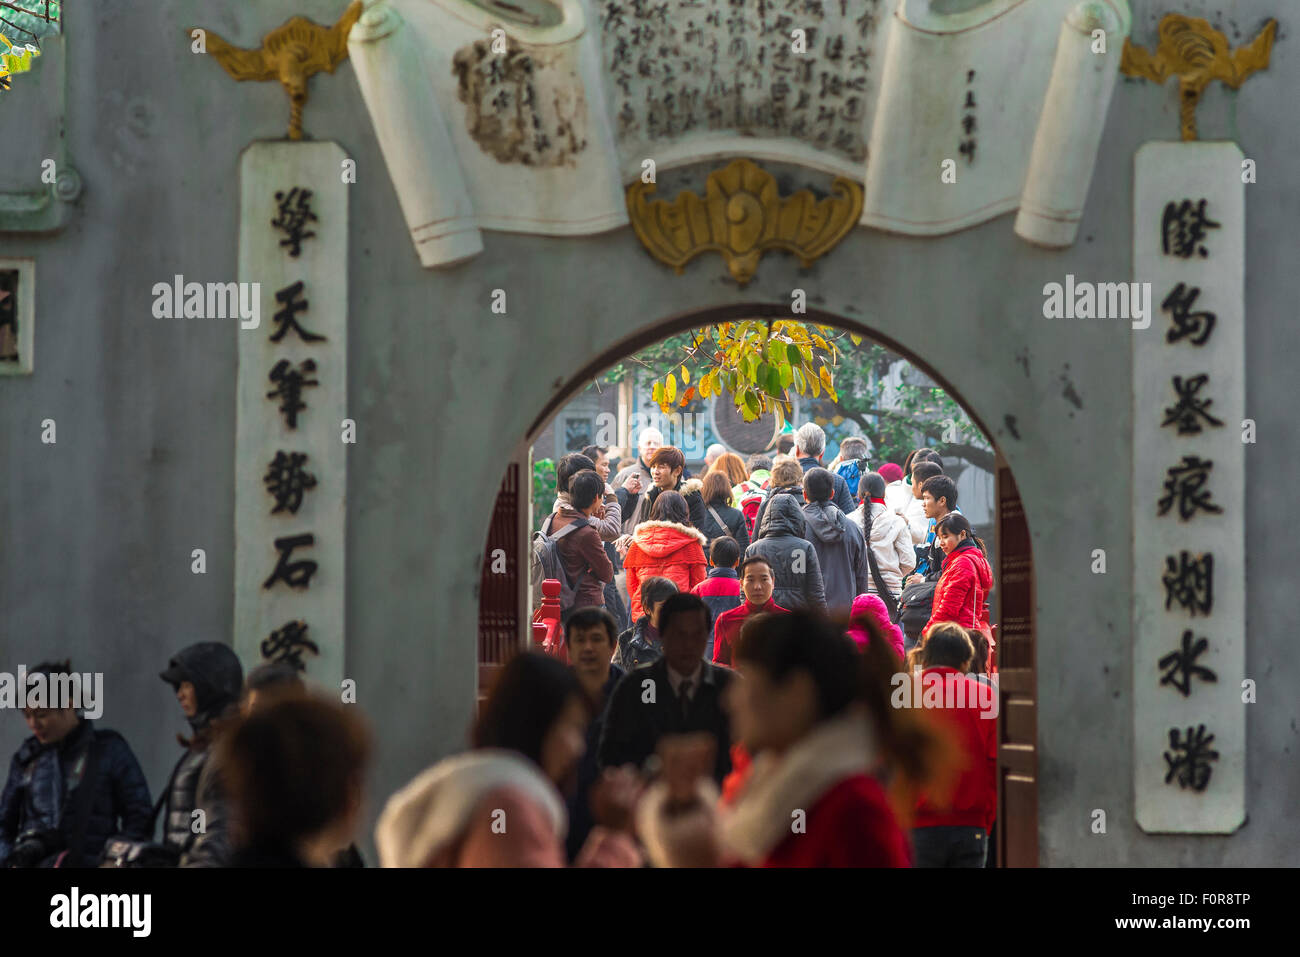 Hanoi huc bridge, tourists crowd the Huc Bridge while visiting the Temple Of The Jade Mound (Den Ngoc Son) Hanoi, - Stock Image